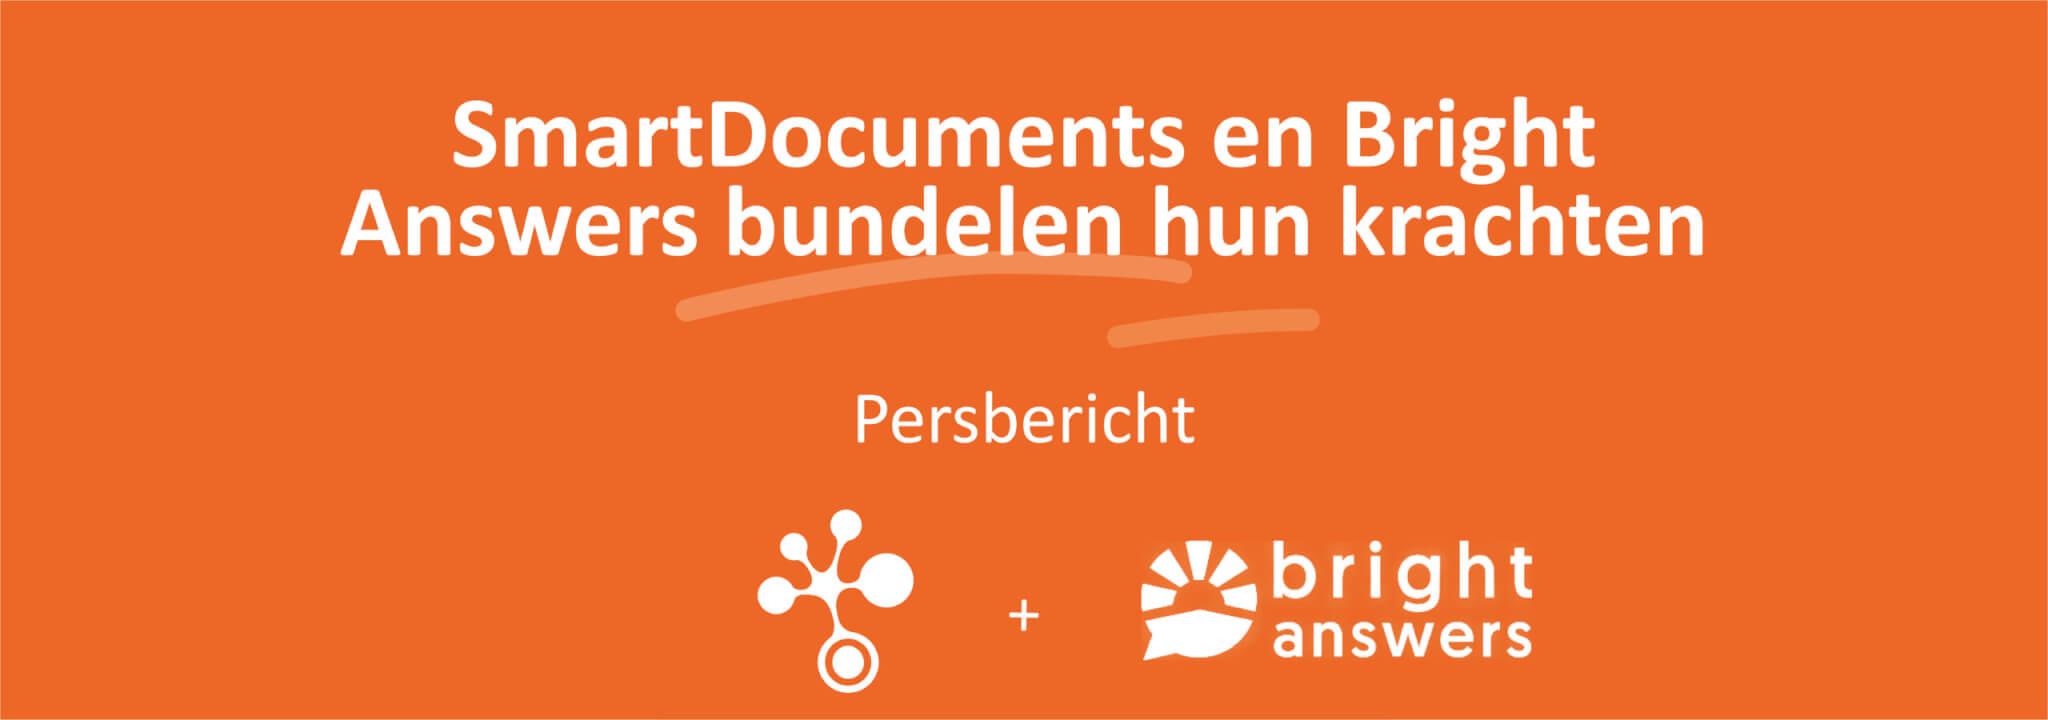 Persbericht SmartDocuments Bright Answers